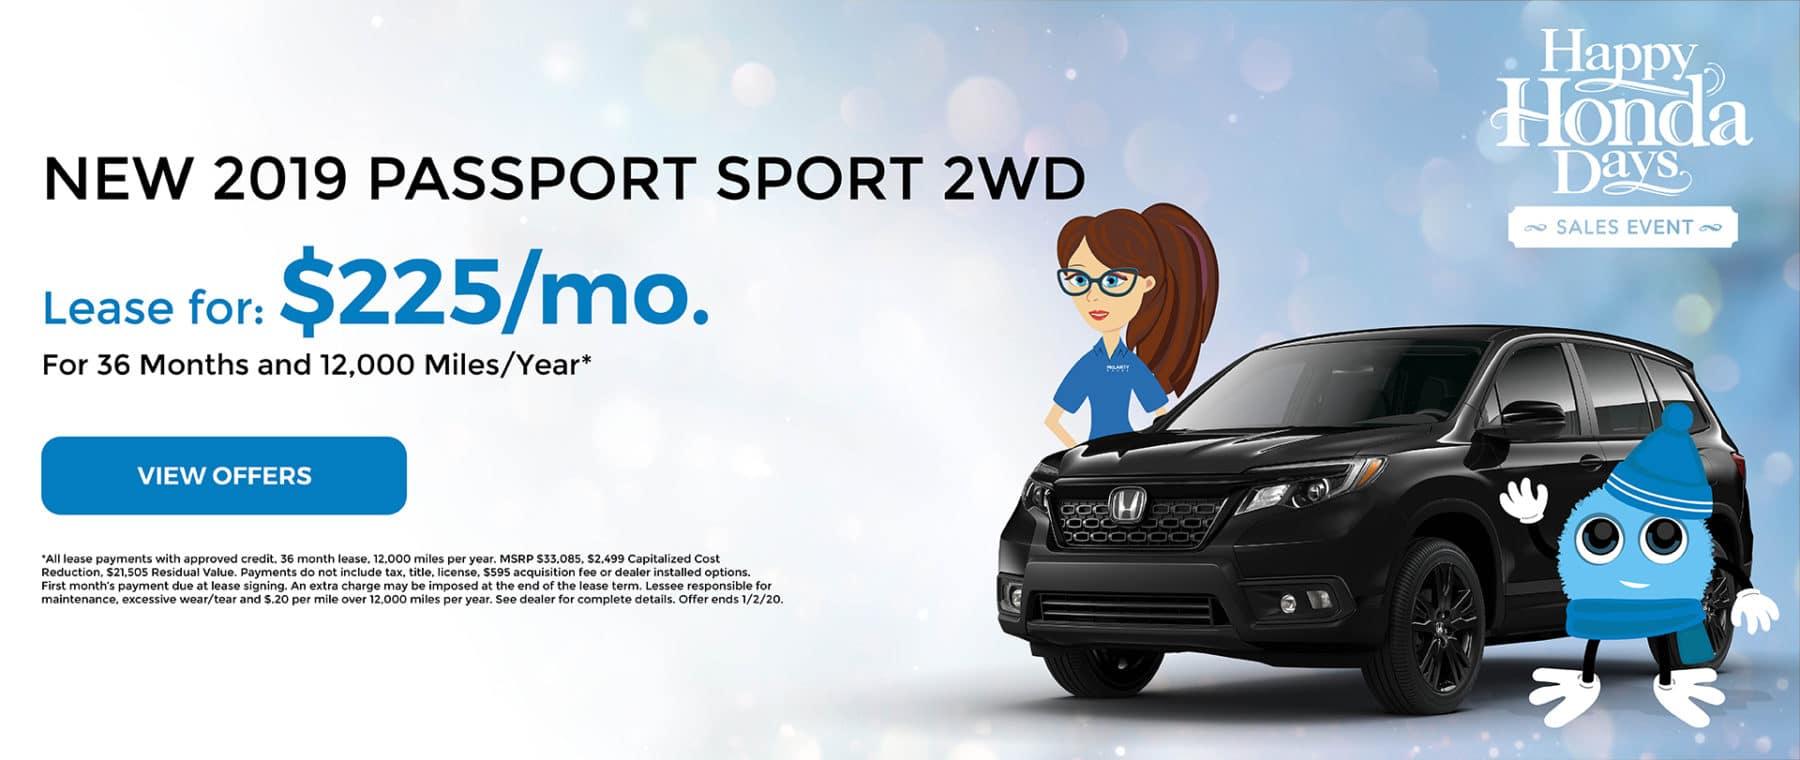 2019 Passport Sport 2WD